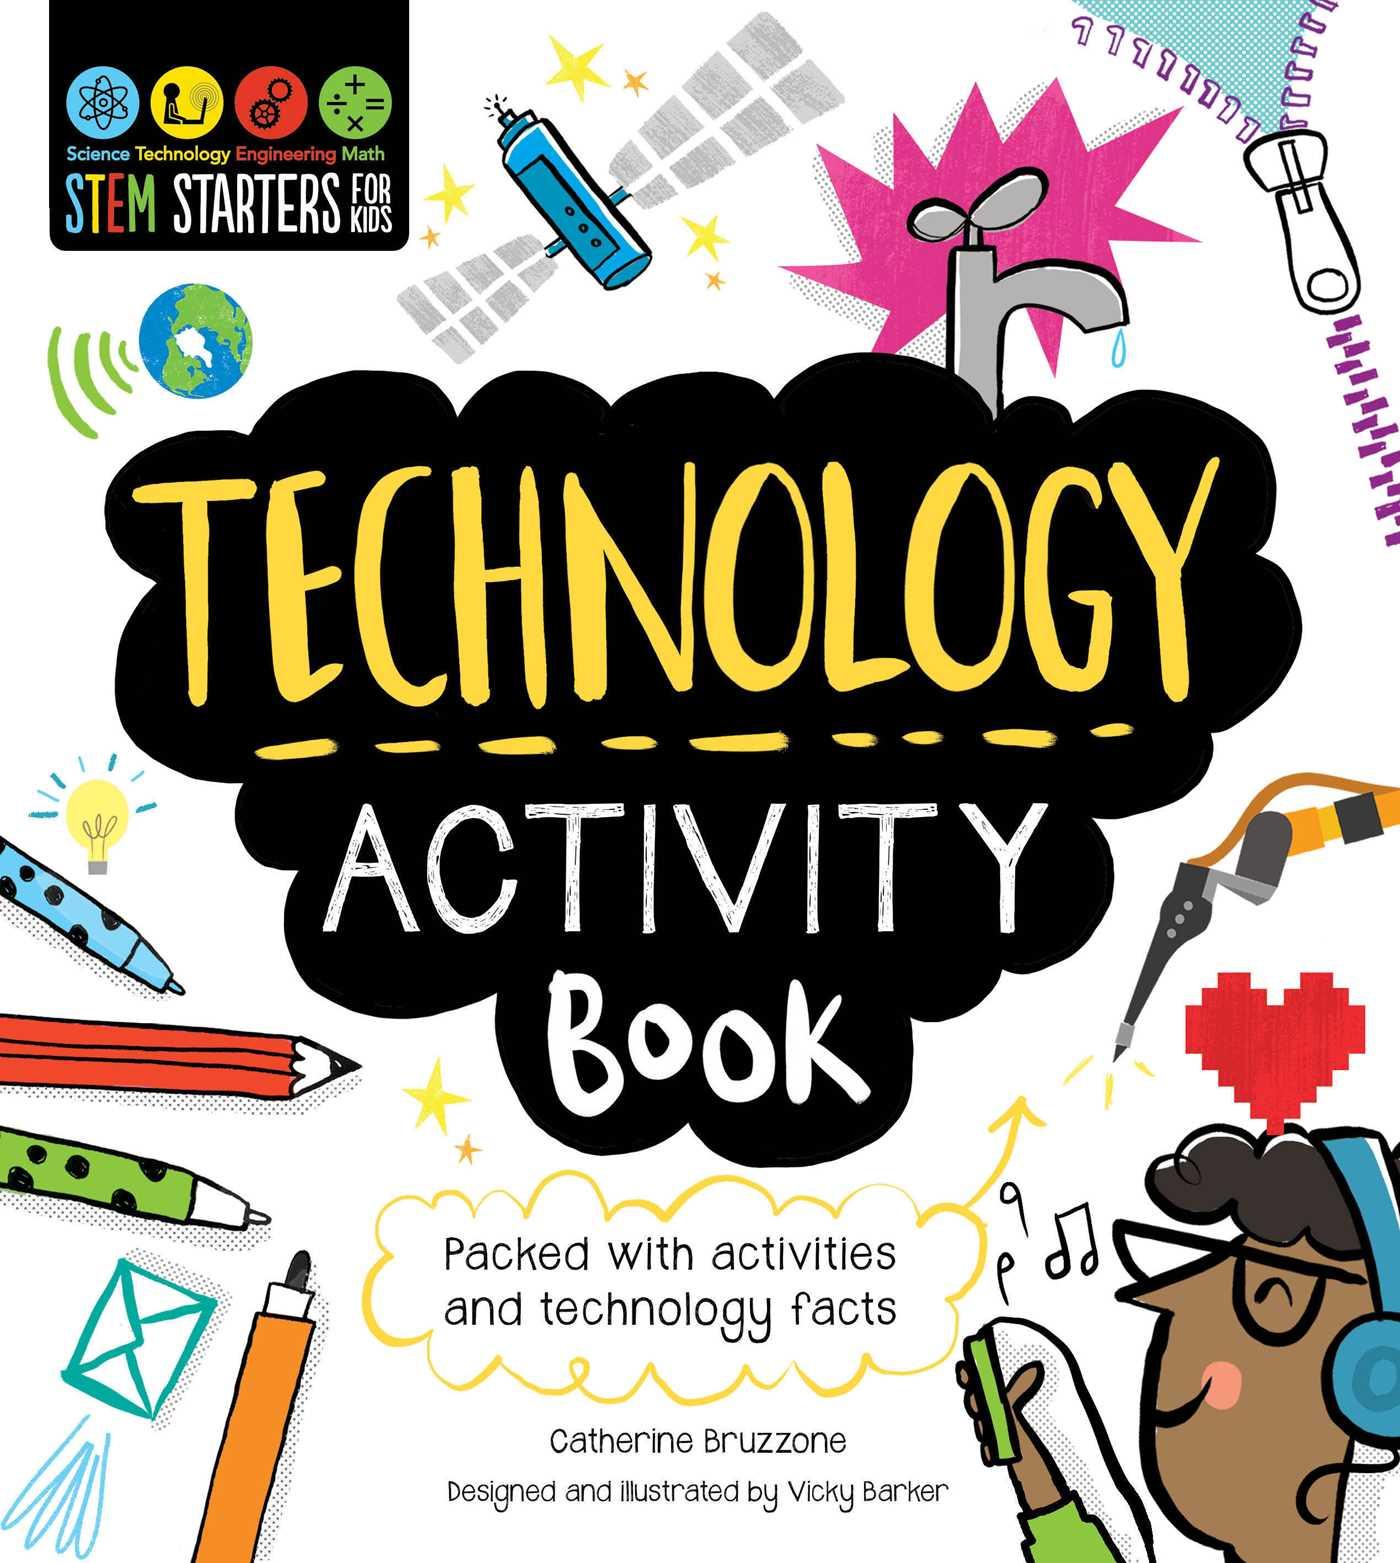 STEM Starters for Kids Technology Activity Book.